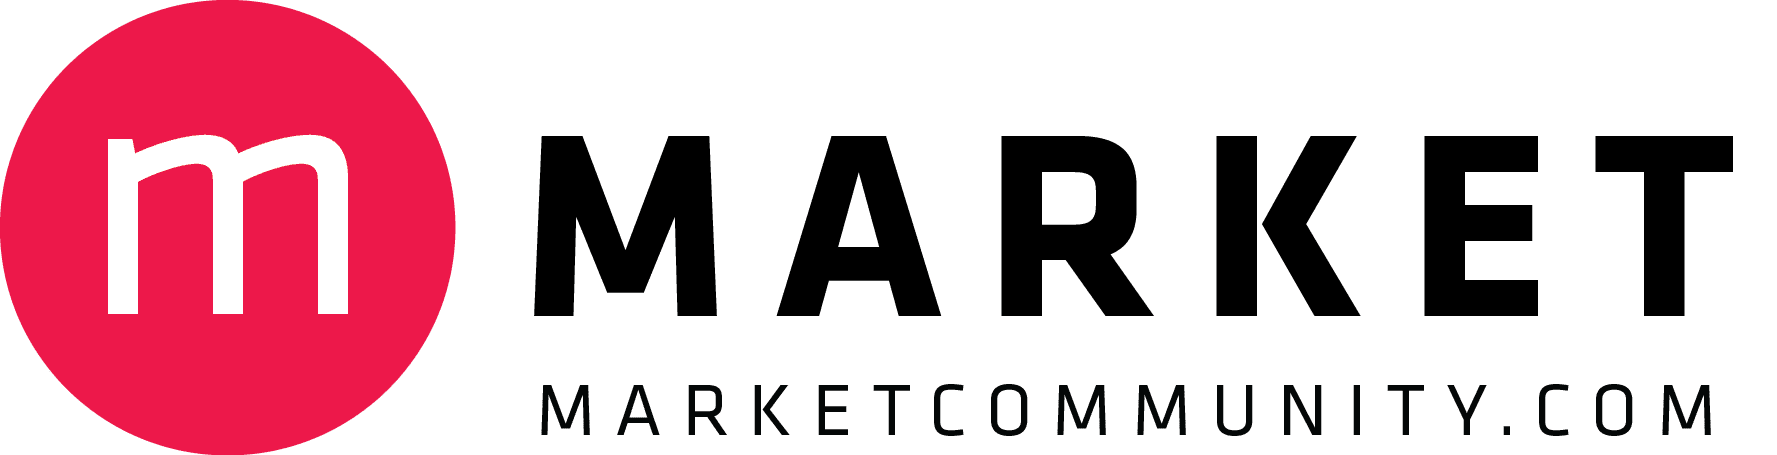 MarketCommunity.com